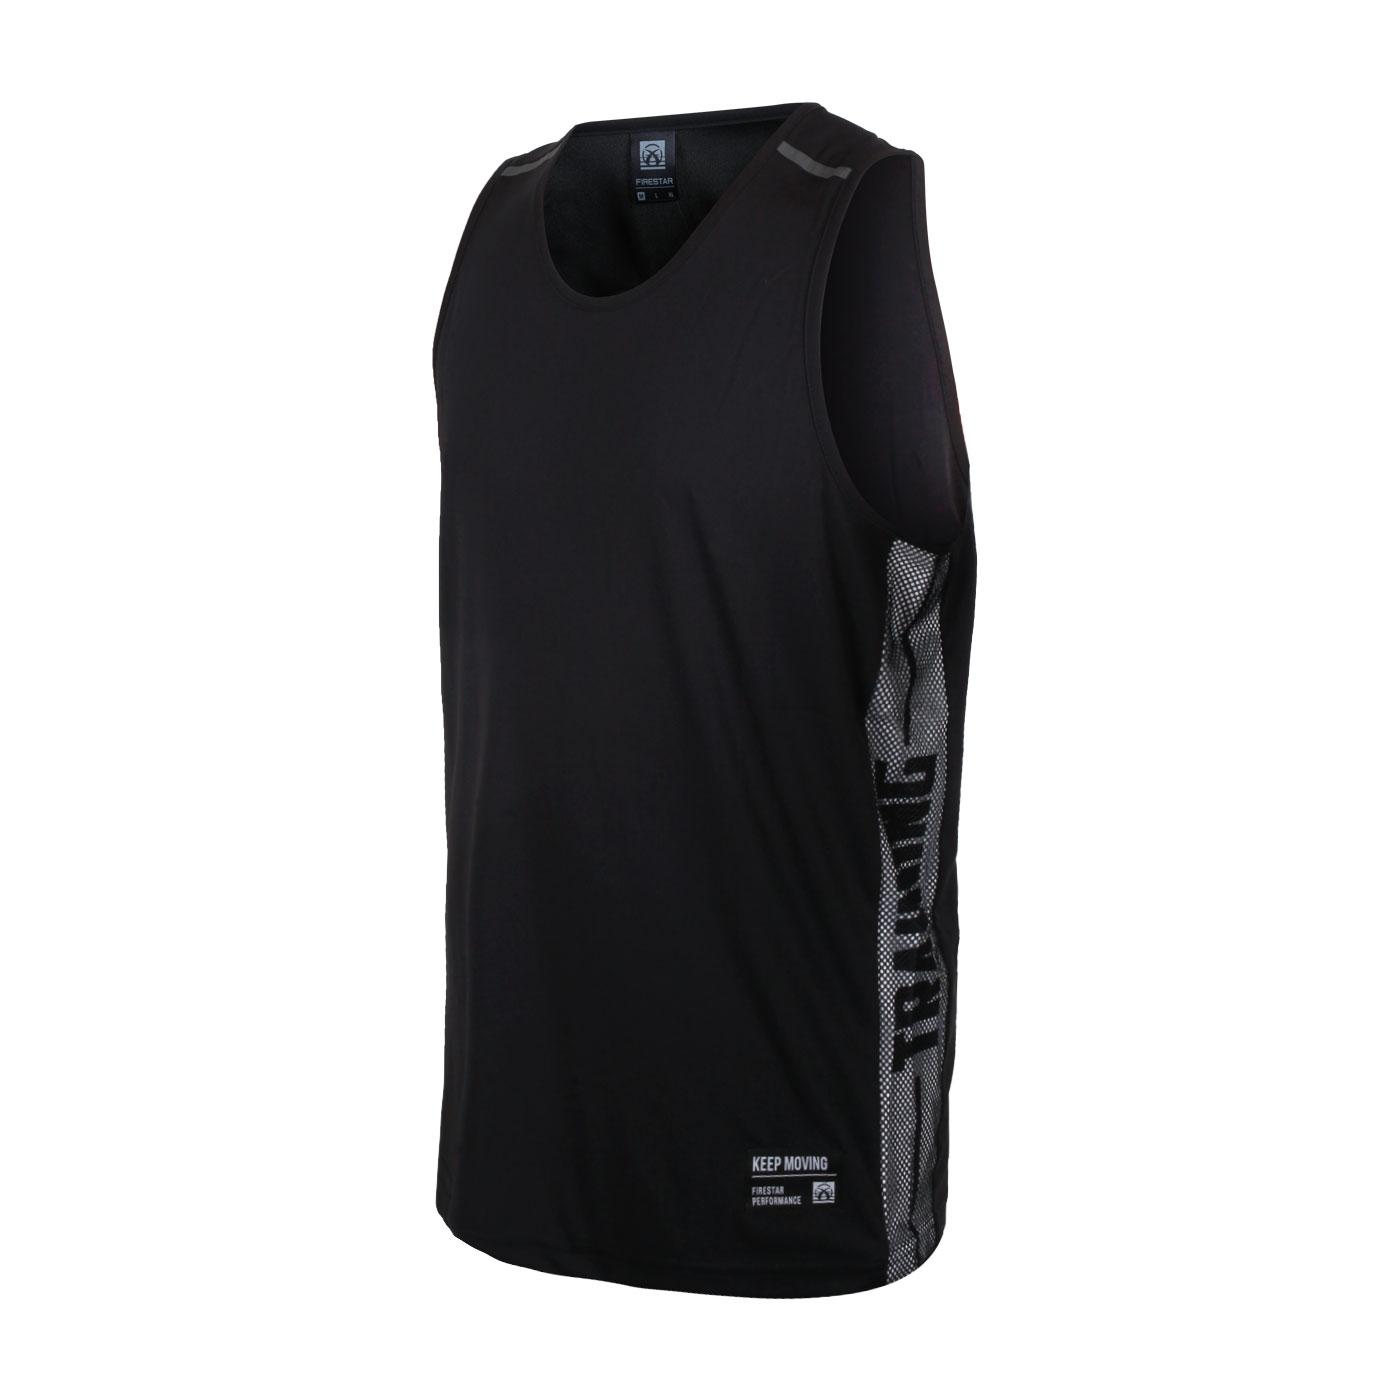 FIRESTAR 男款吸排訓練籃球背心 B1709-10 - 黑灰